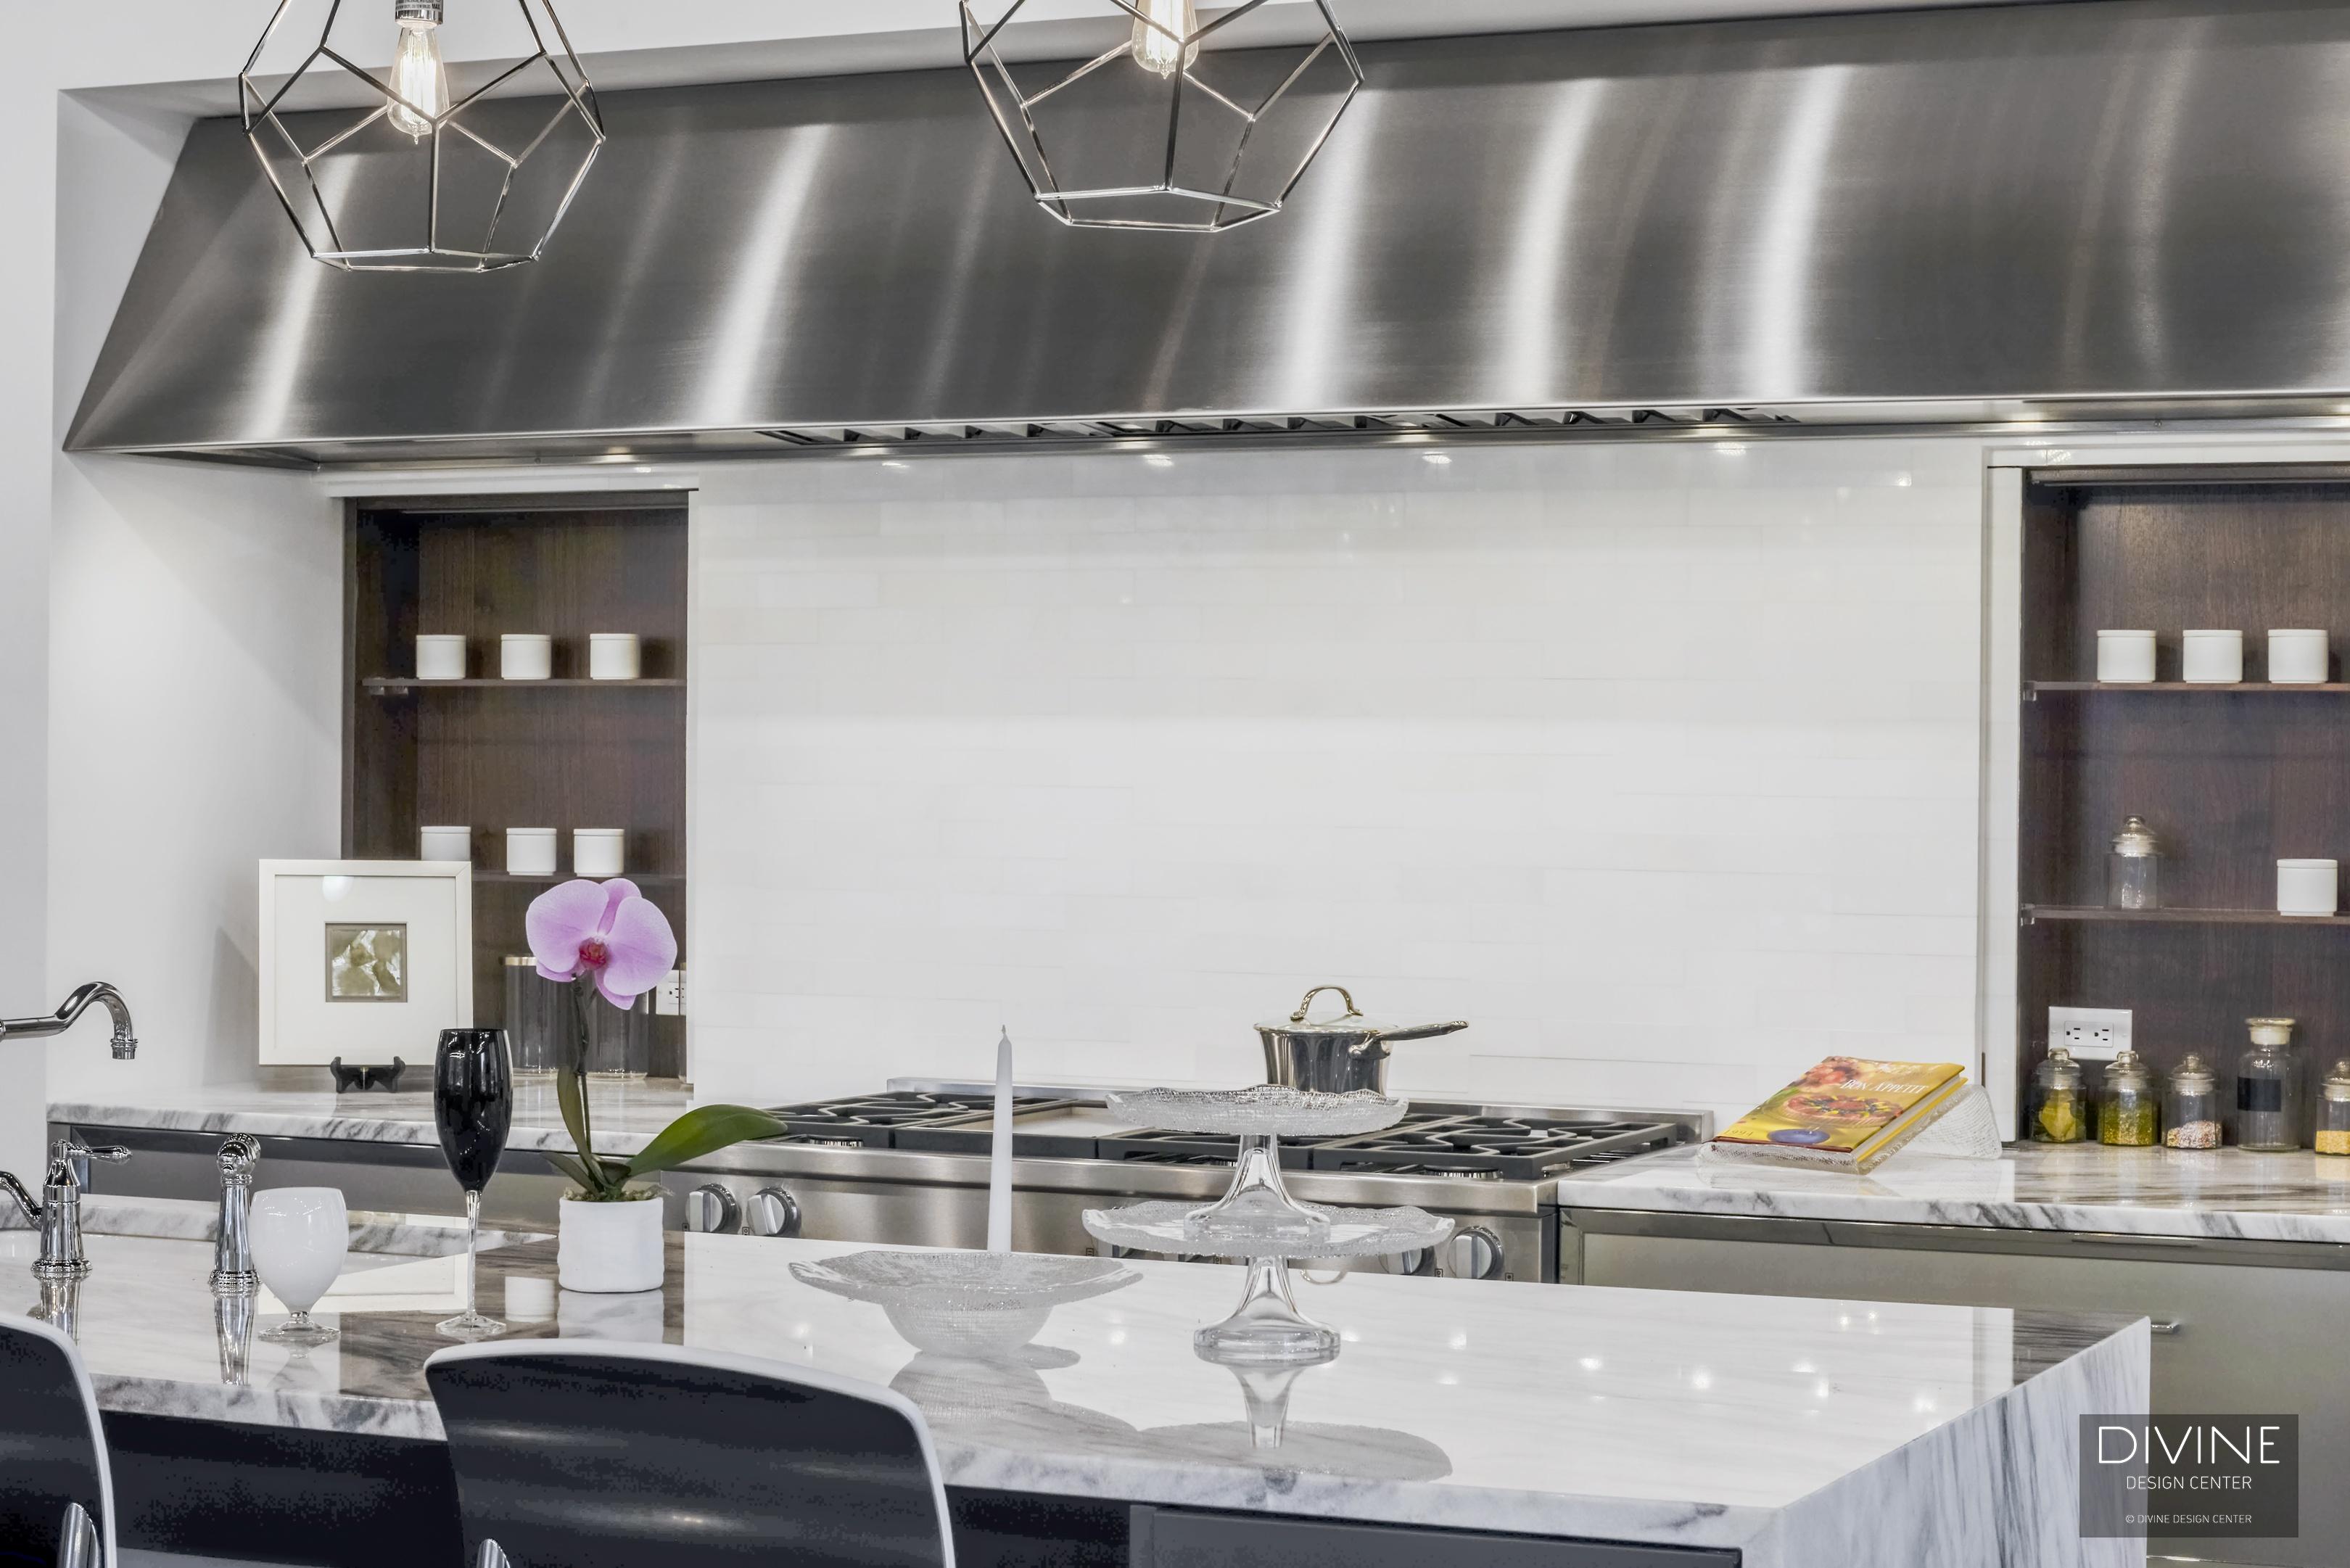 quartzite counter top, range hood, outlets, stainless steel appliances, dark wood, divine design center, TRUFIG outlets, Boston, Massachusetts, kitchen, modern, modern kitchen, pendant lights